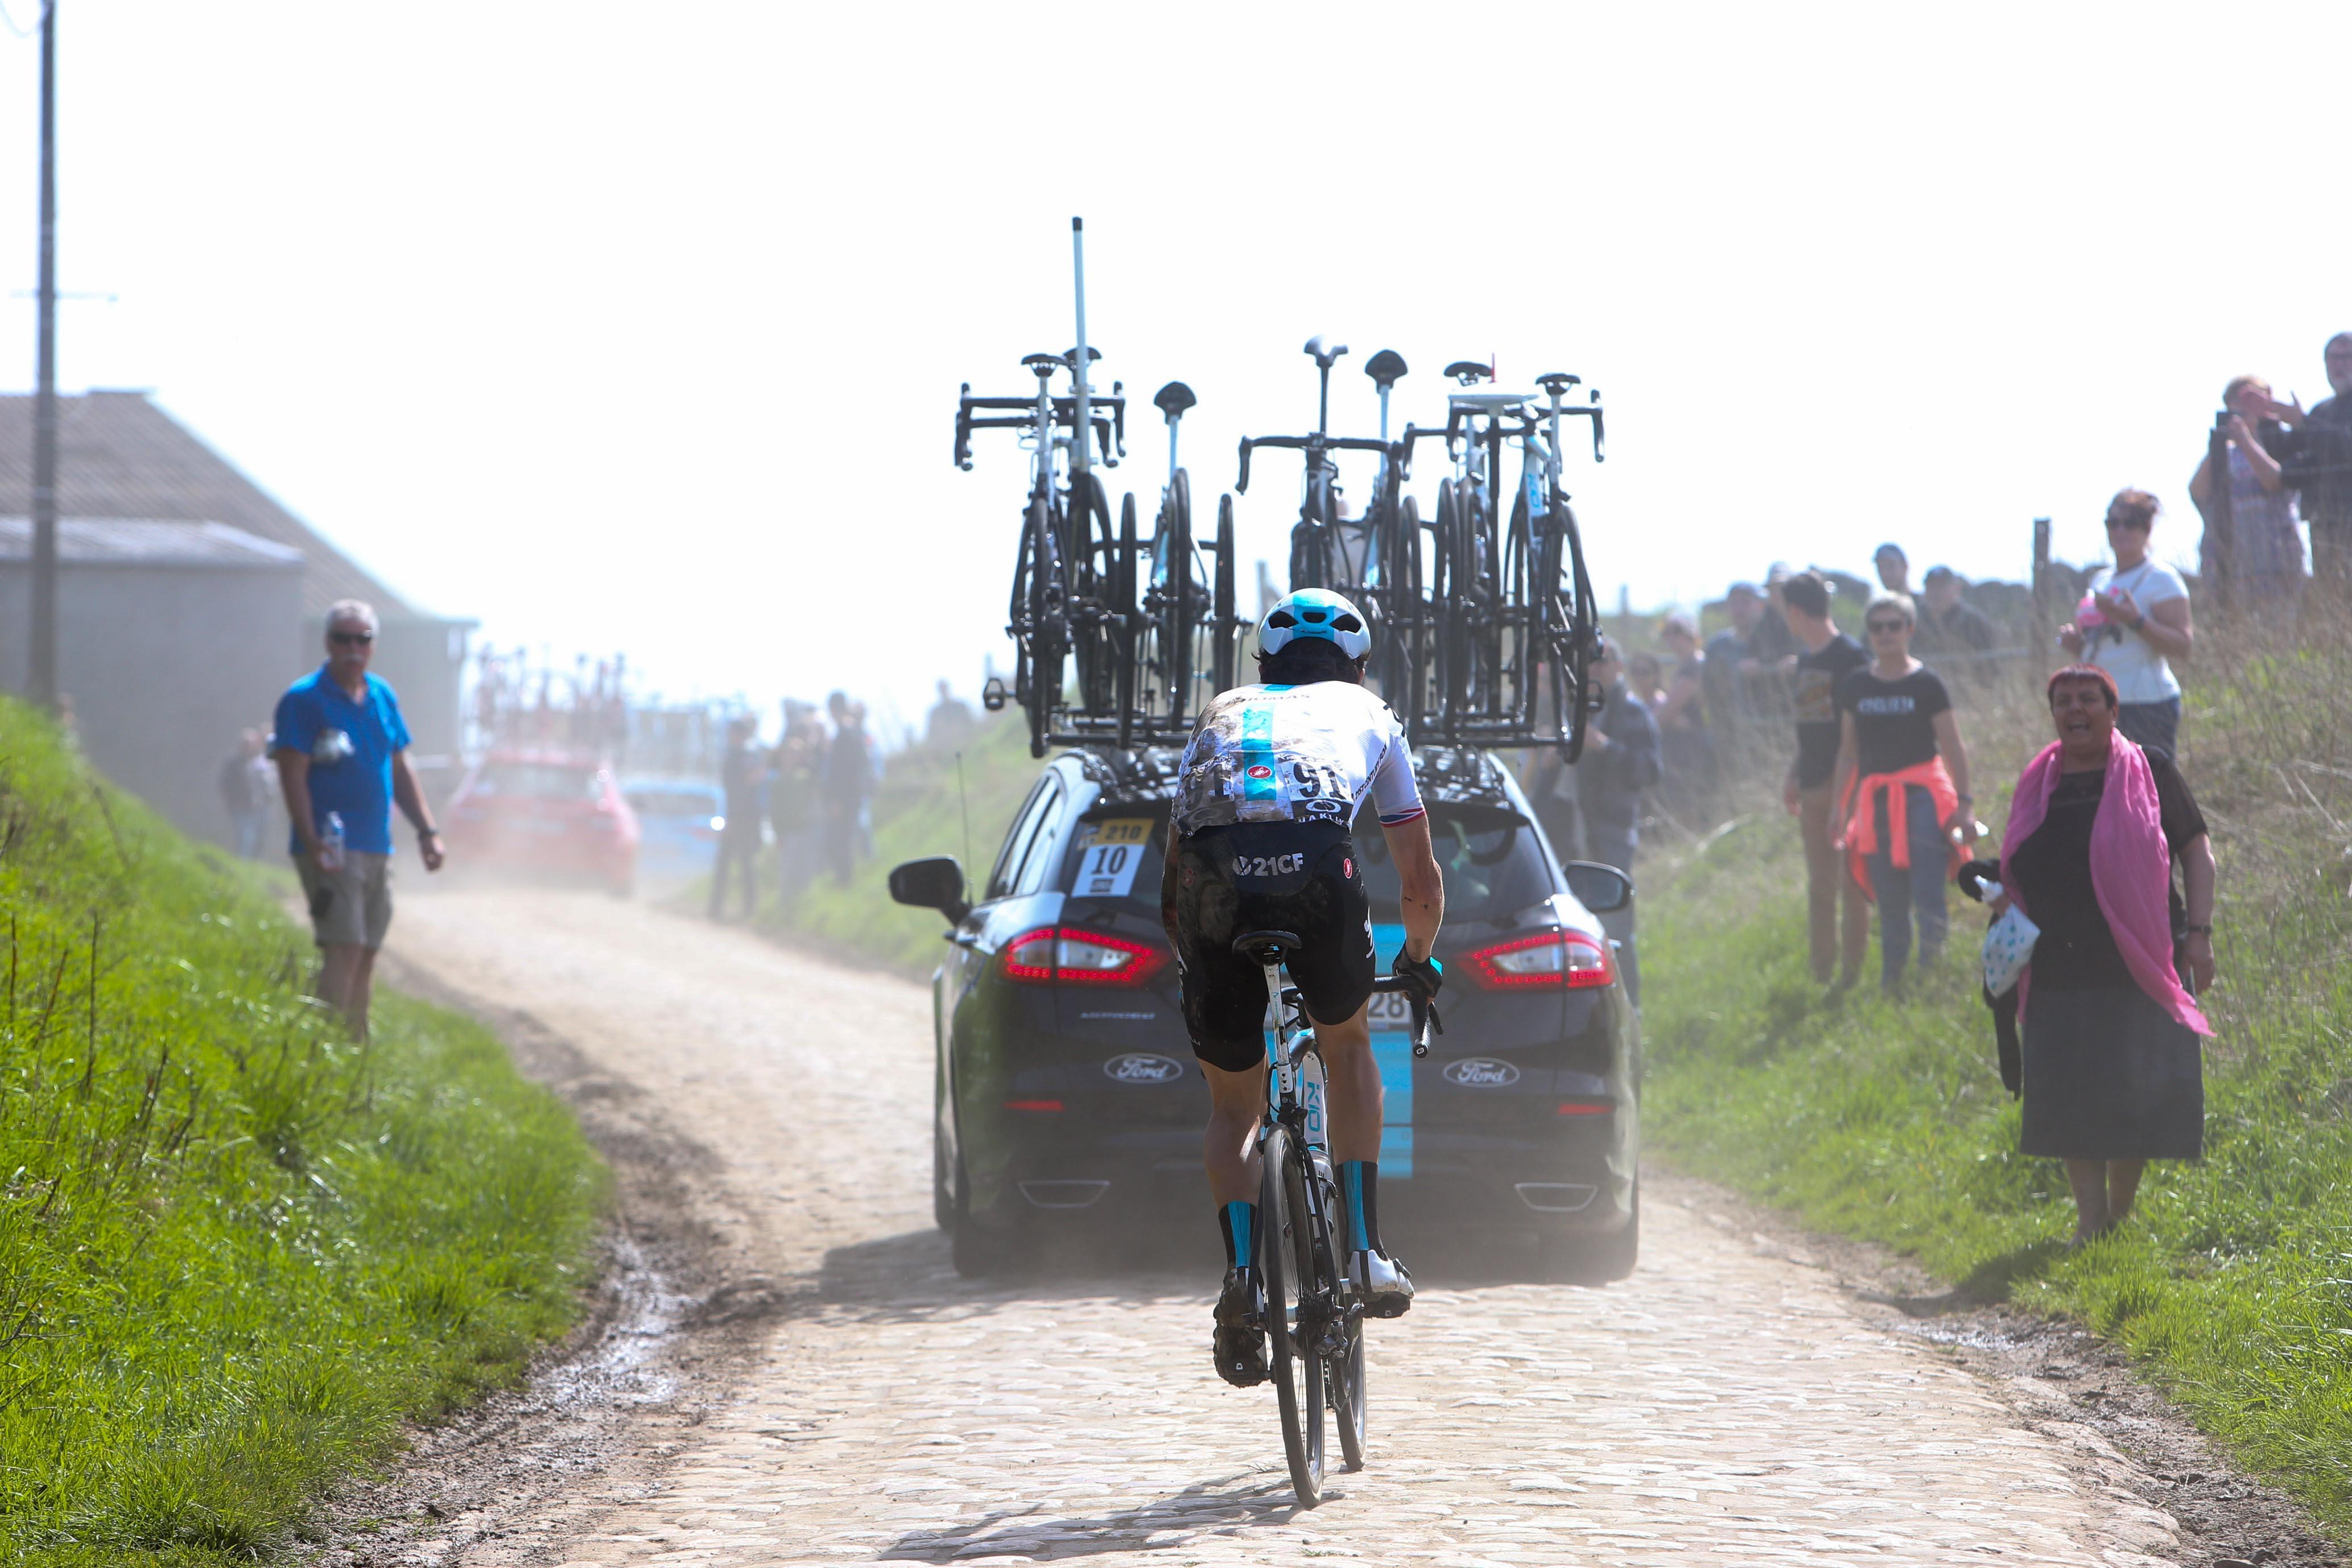 2018 Paris Roubaix 116th Edition - Geraint Thomas (Team Sky Proc